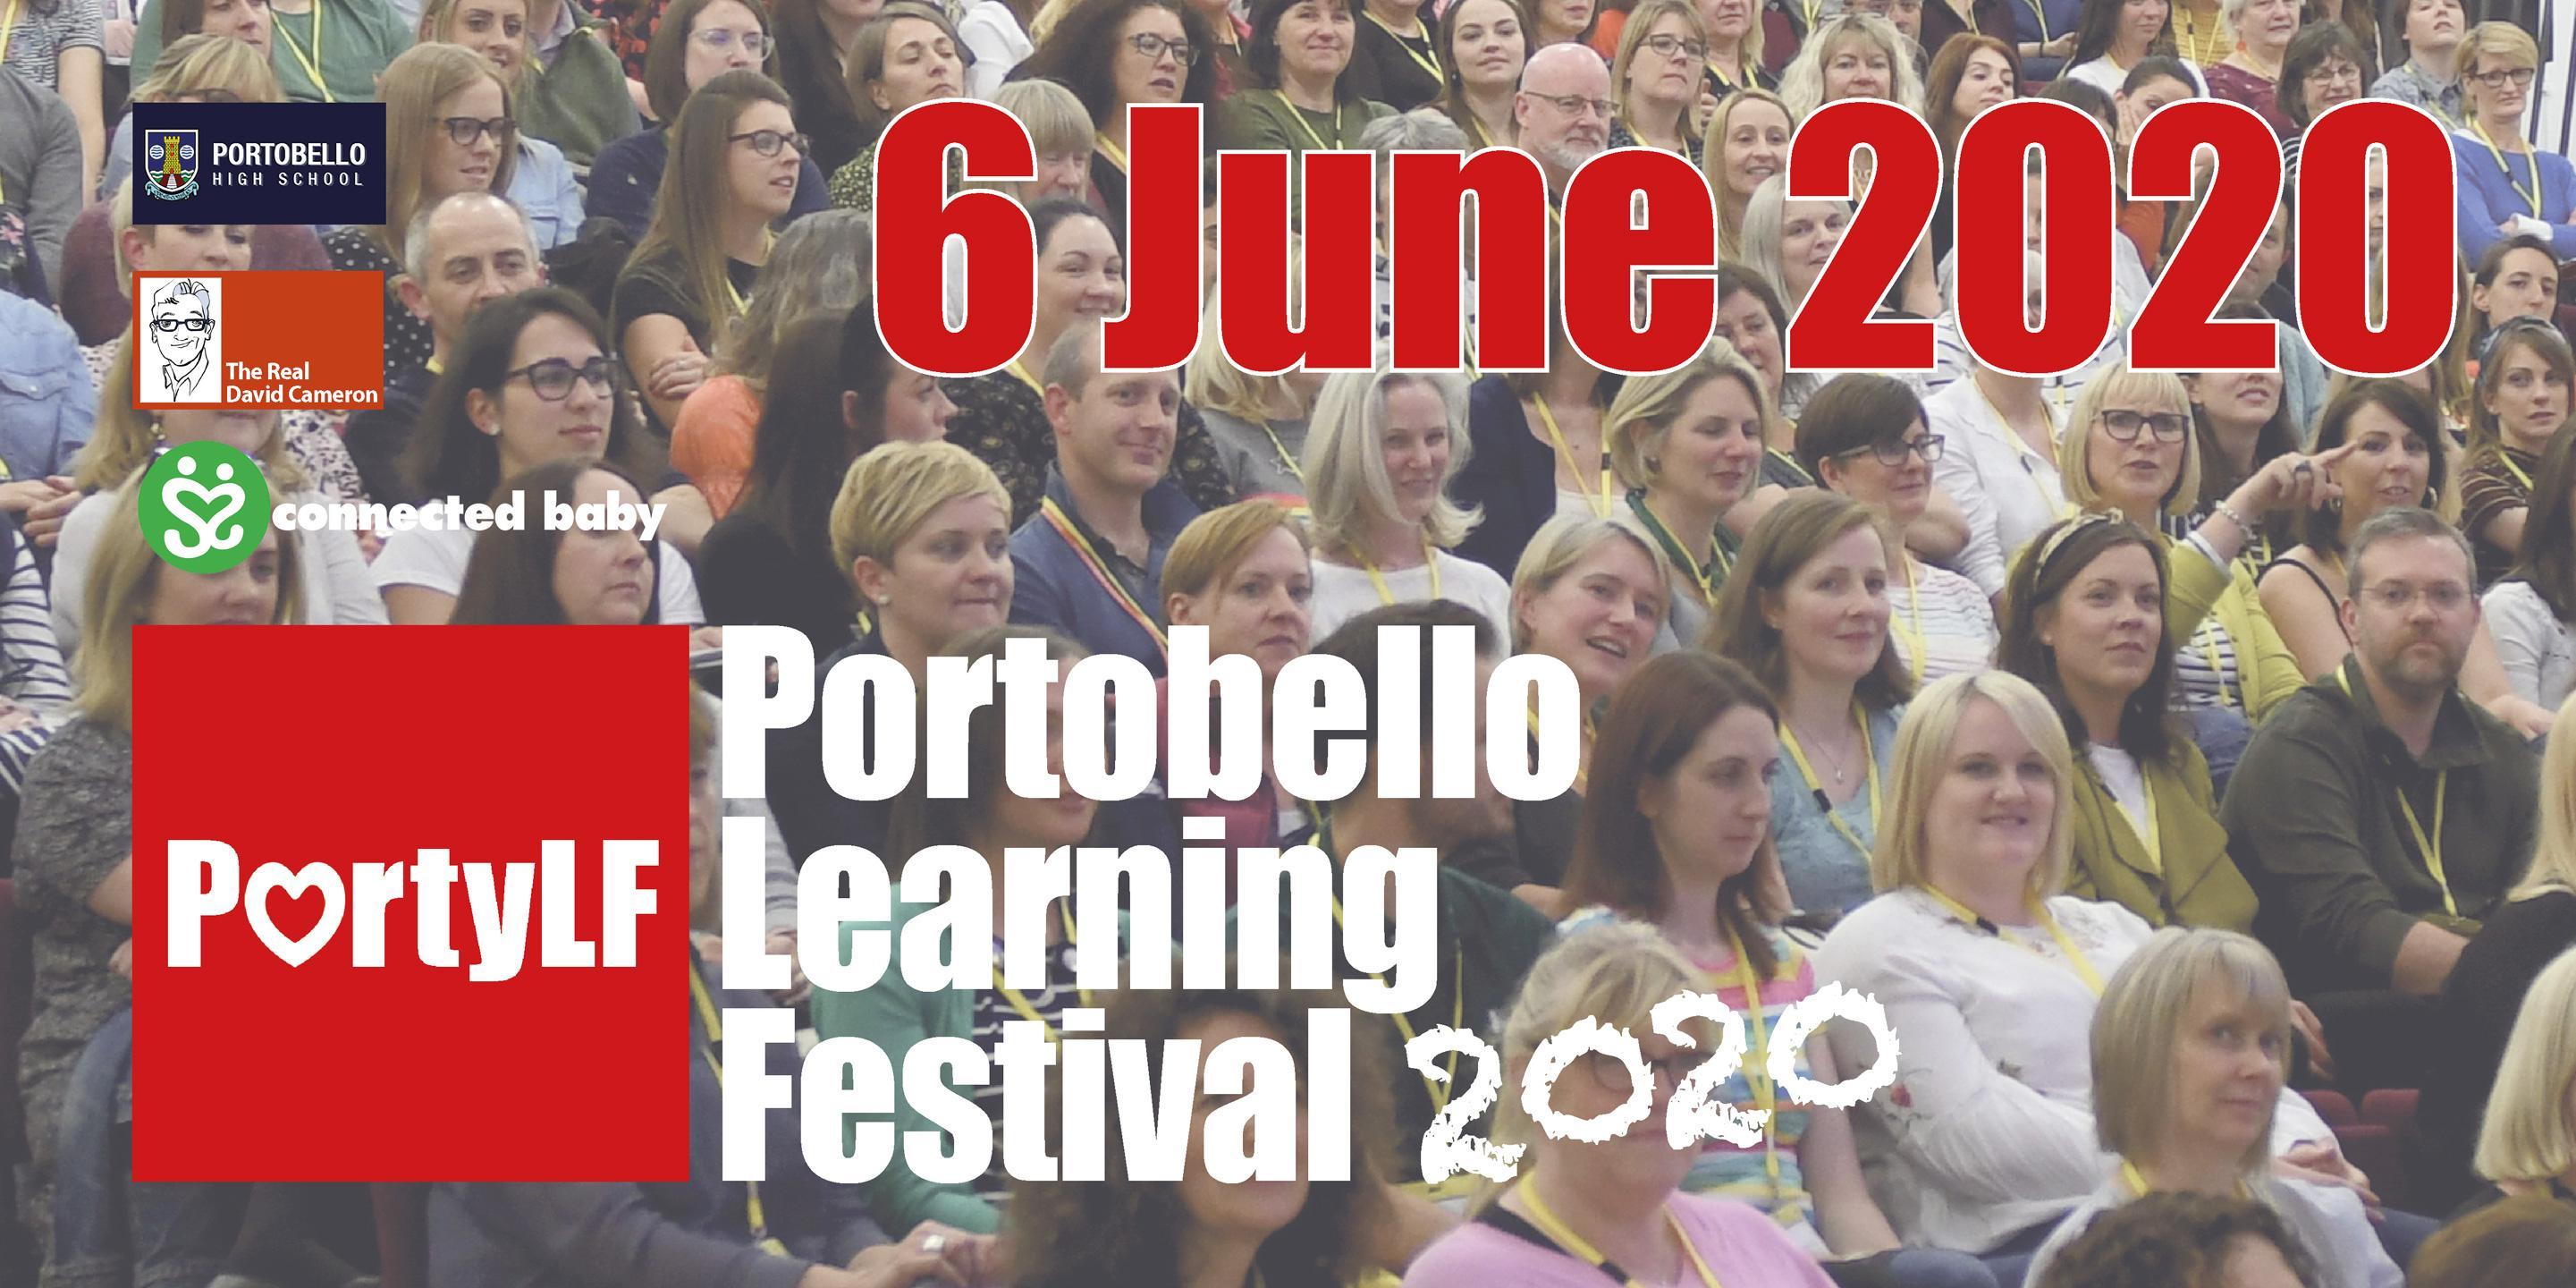 Portobello Learning Festival 2020 – Refreshing the Reality